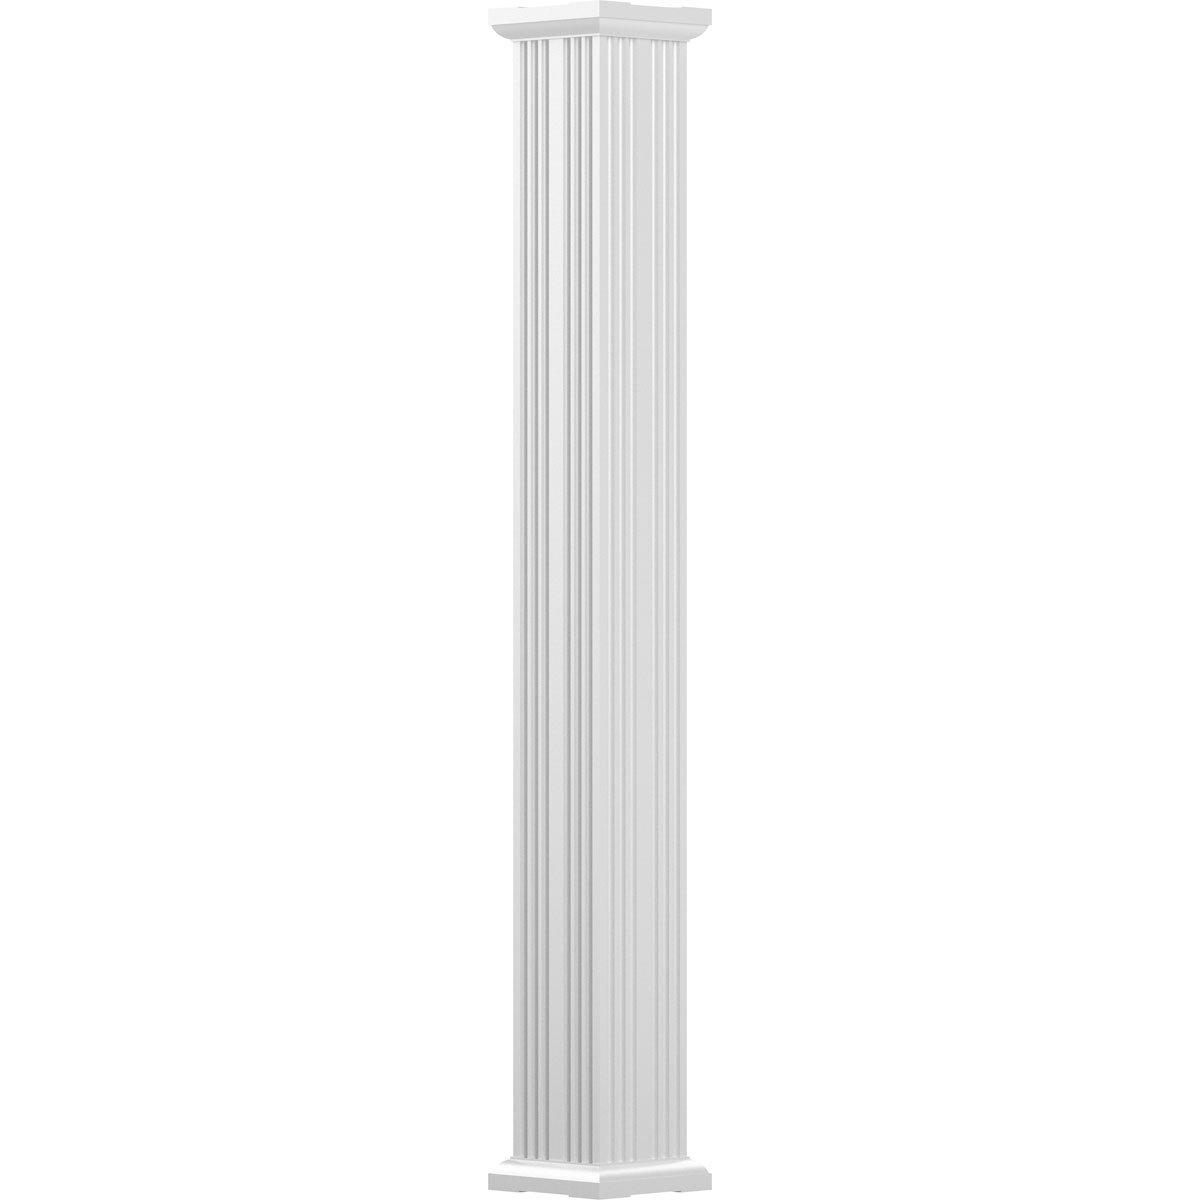 Square Shaft Non-Tapered Textured Black Finish w// Capital /& Base Fluted AFCO EA0408ENFSGTUTU 4 x 8 Endura-Aluminum Column Load-Bearing 12,000 lbs